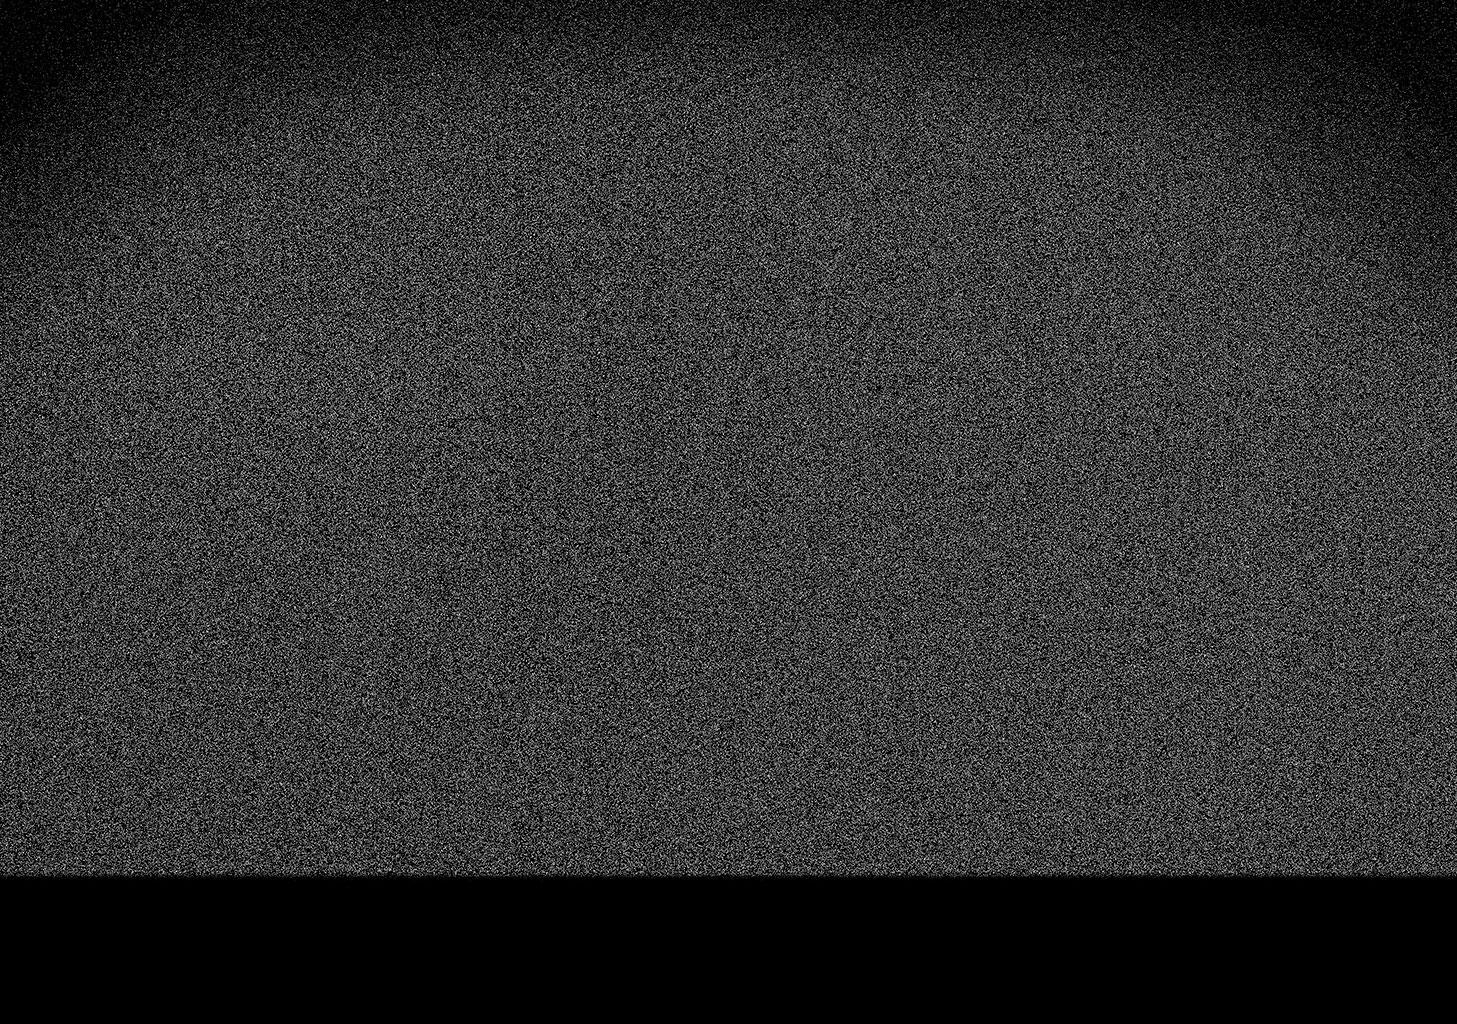 Incertitude-#4001-·-unique-gelatine-silver-print-on-baryta-·-125-x-210-cm